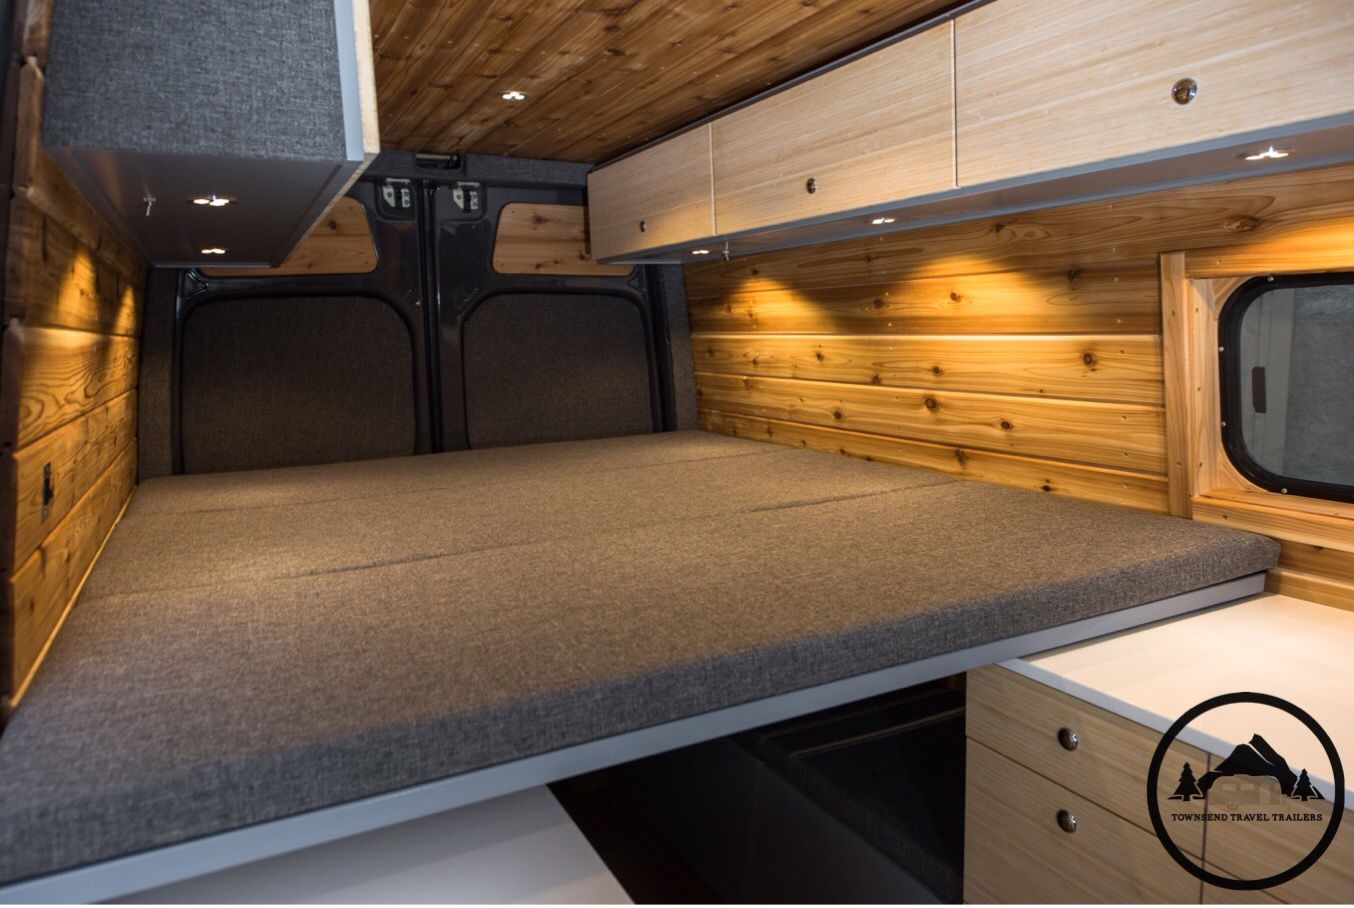 Converted Mercedes Sprinter Van by Townsend Travel